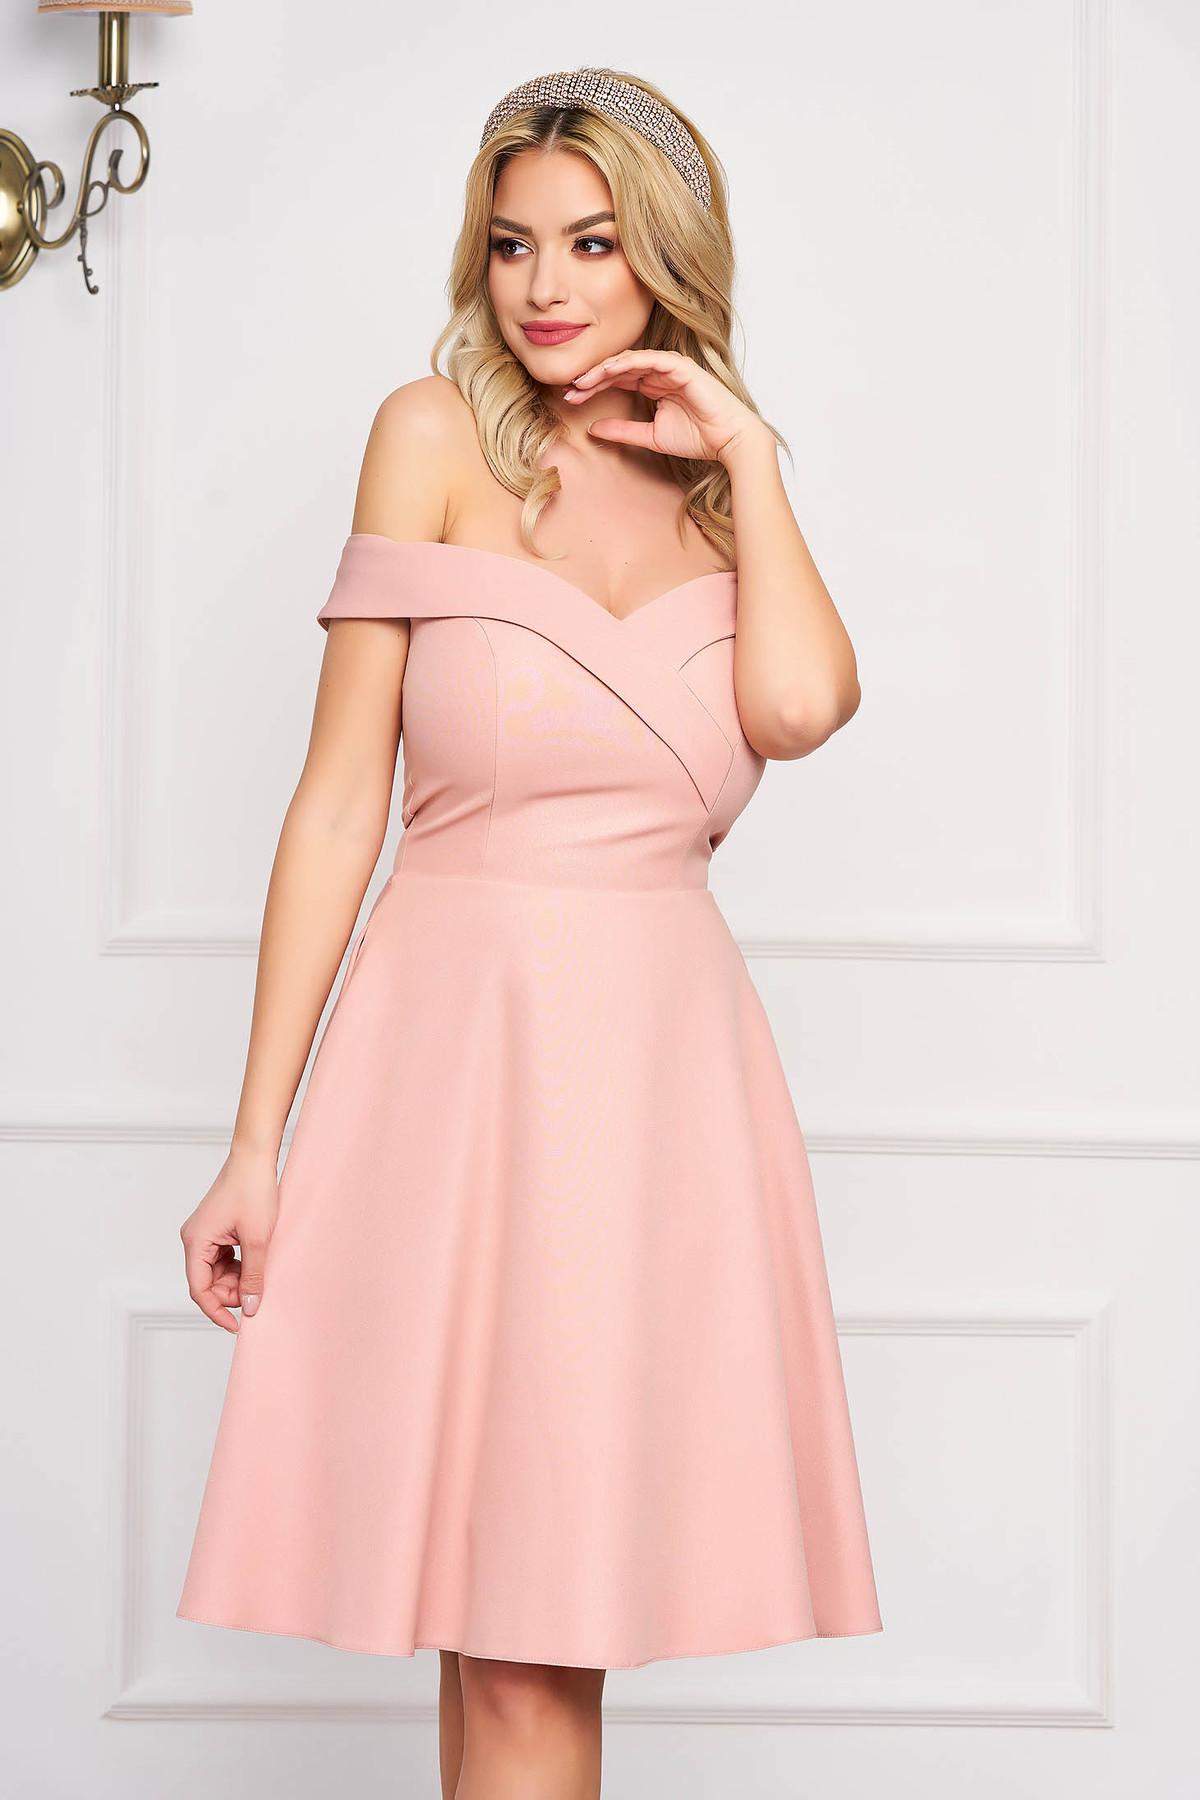 Rochie StarShinerS roz prafuit midi de ocazie din stofa usor elastica in clos cu umeri goi StarShinerS